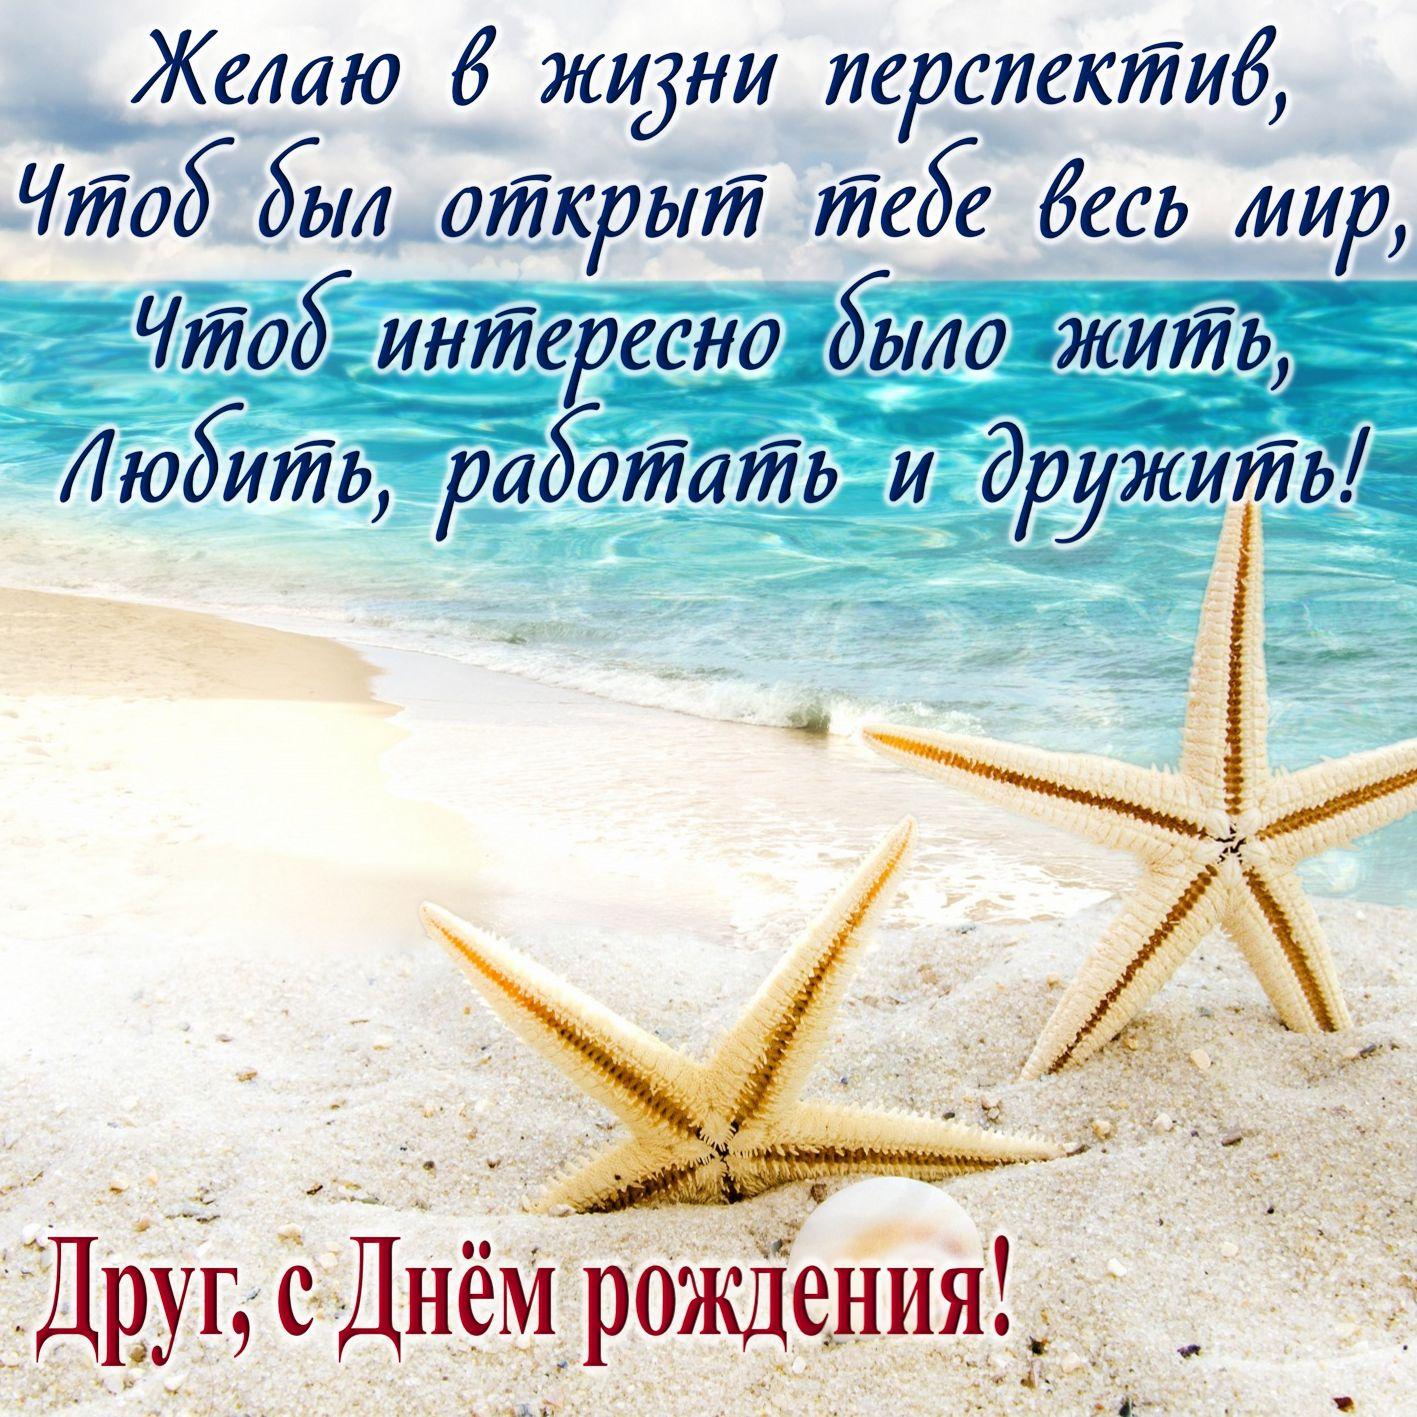 Морские звезды на песке и пожелание другу